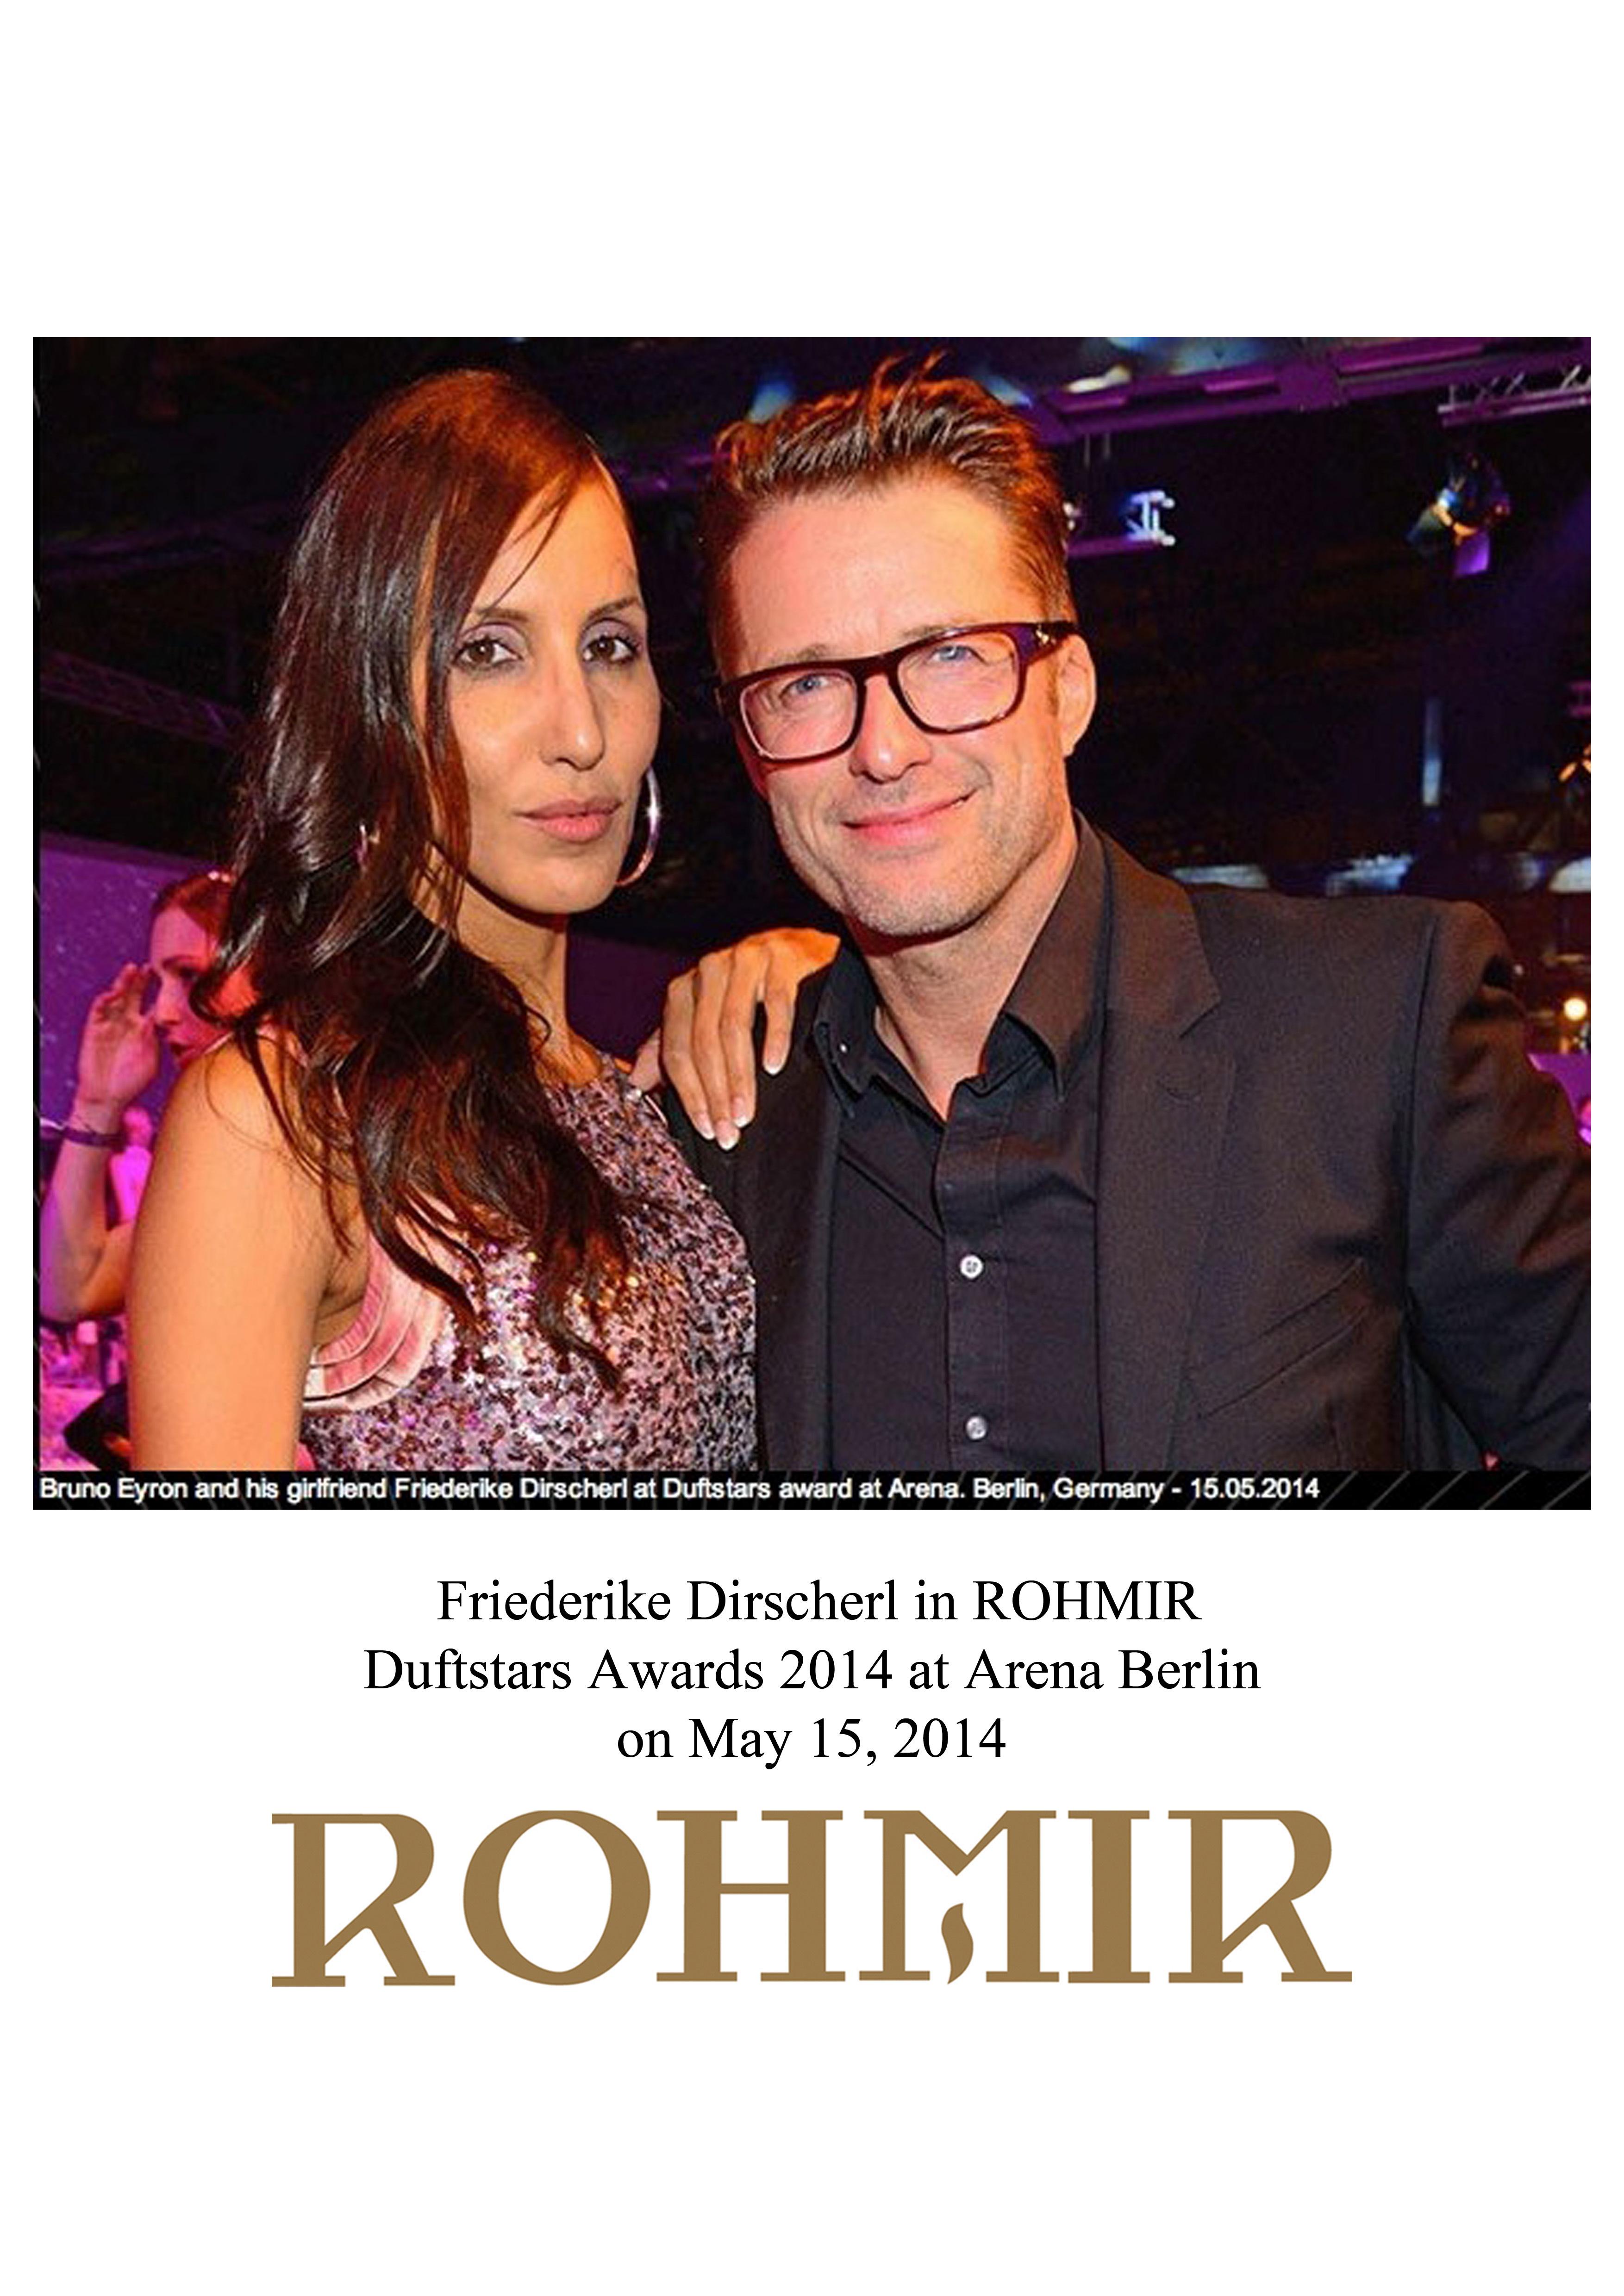 Friederike-Dirscherl-in-ROHMIR-Duftstars-Awards-2014-at-arena-Berlin